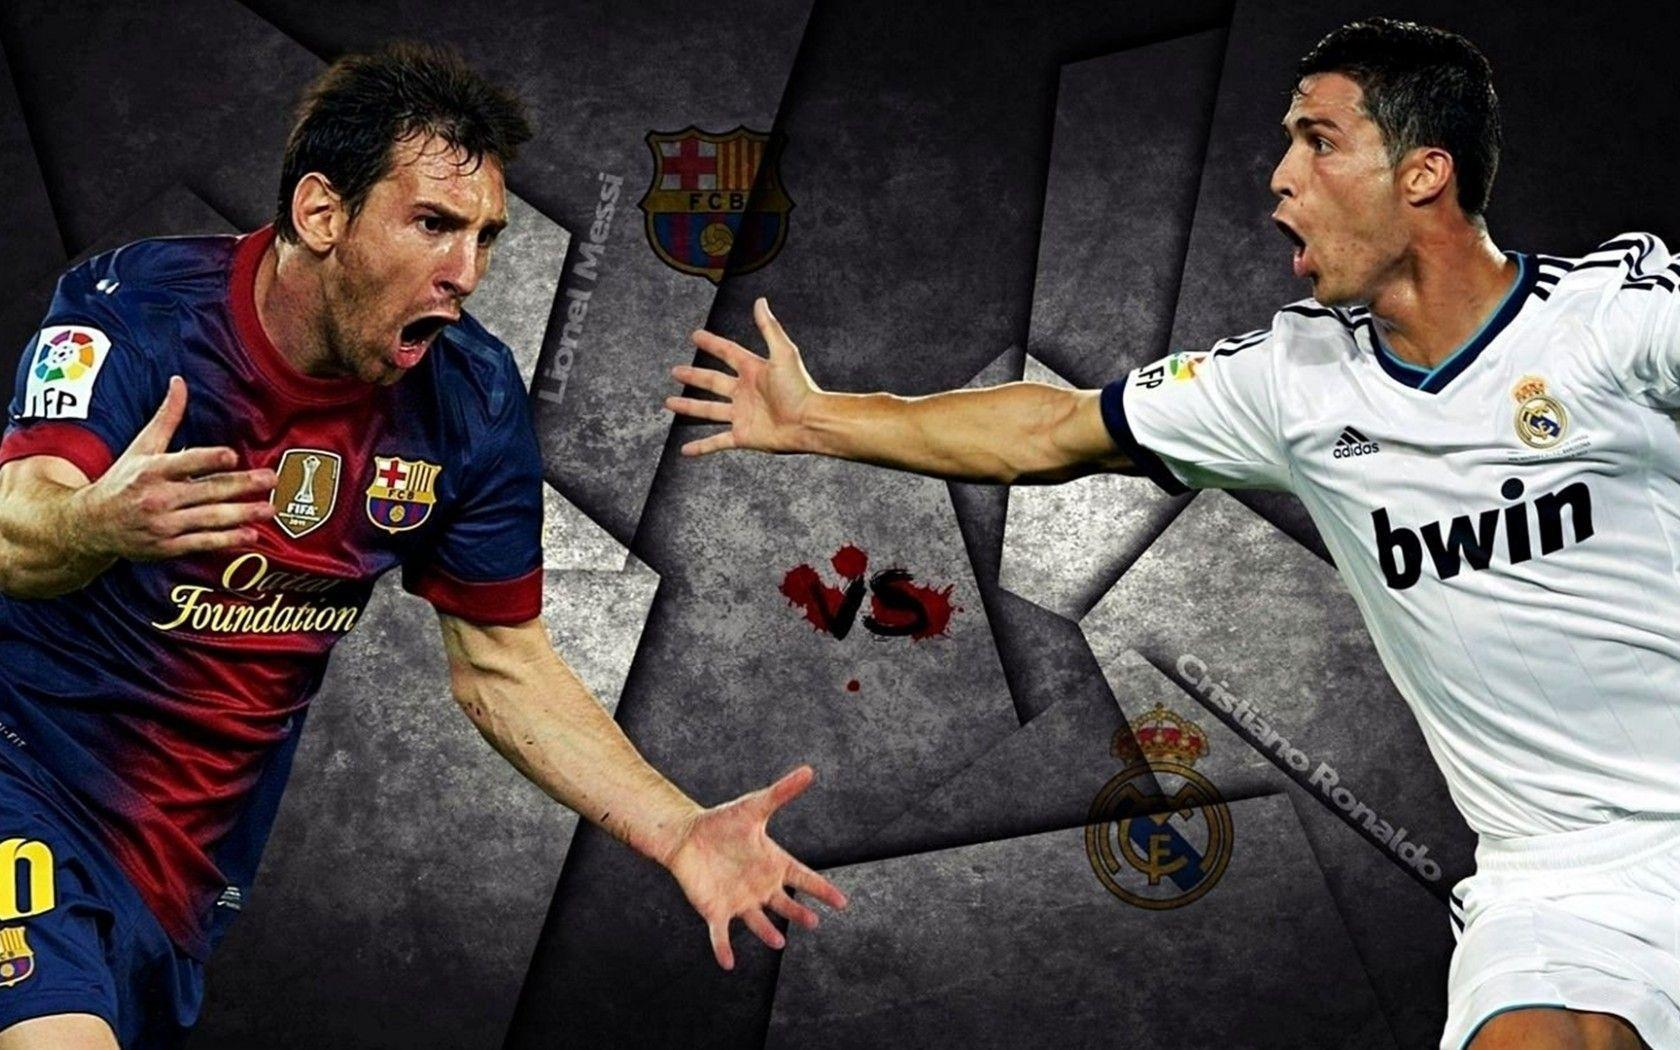 Ronaldo Vs Messi Wallpaper 2014 Messi Vs Ronald...